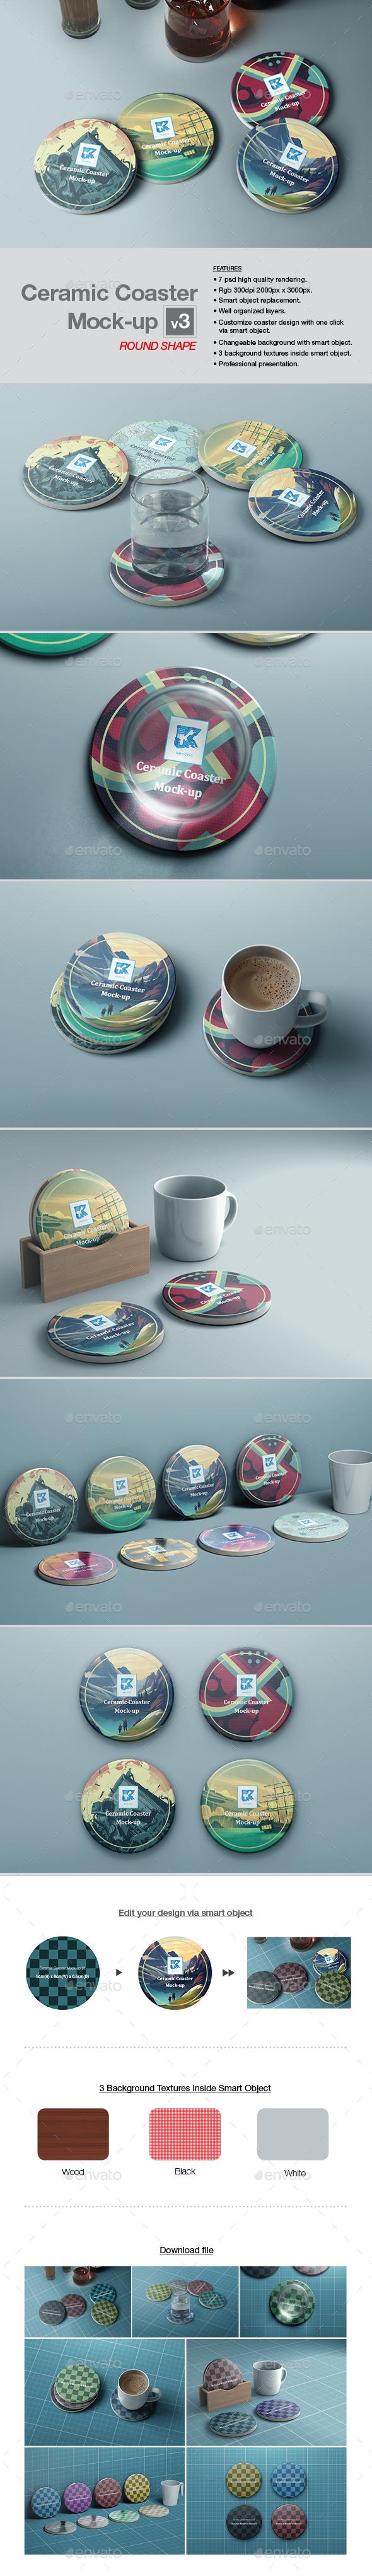 Ceramic Coaster Mock-up v3 - Print Product Mock-Ups